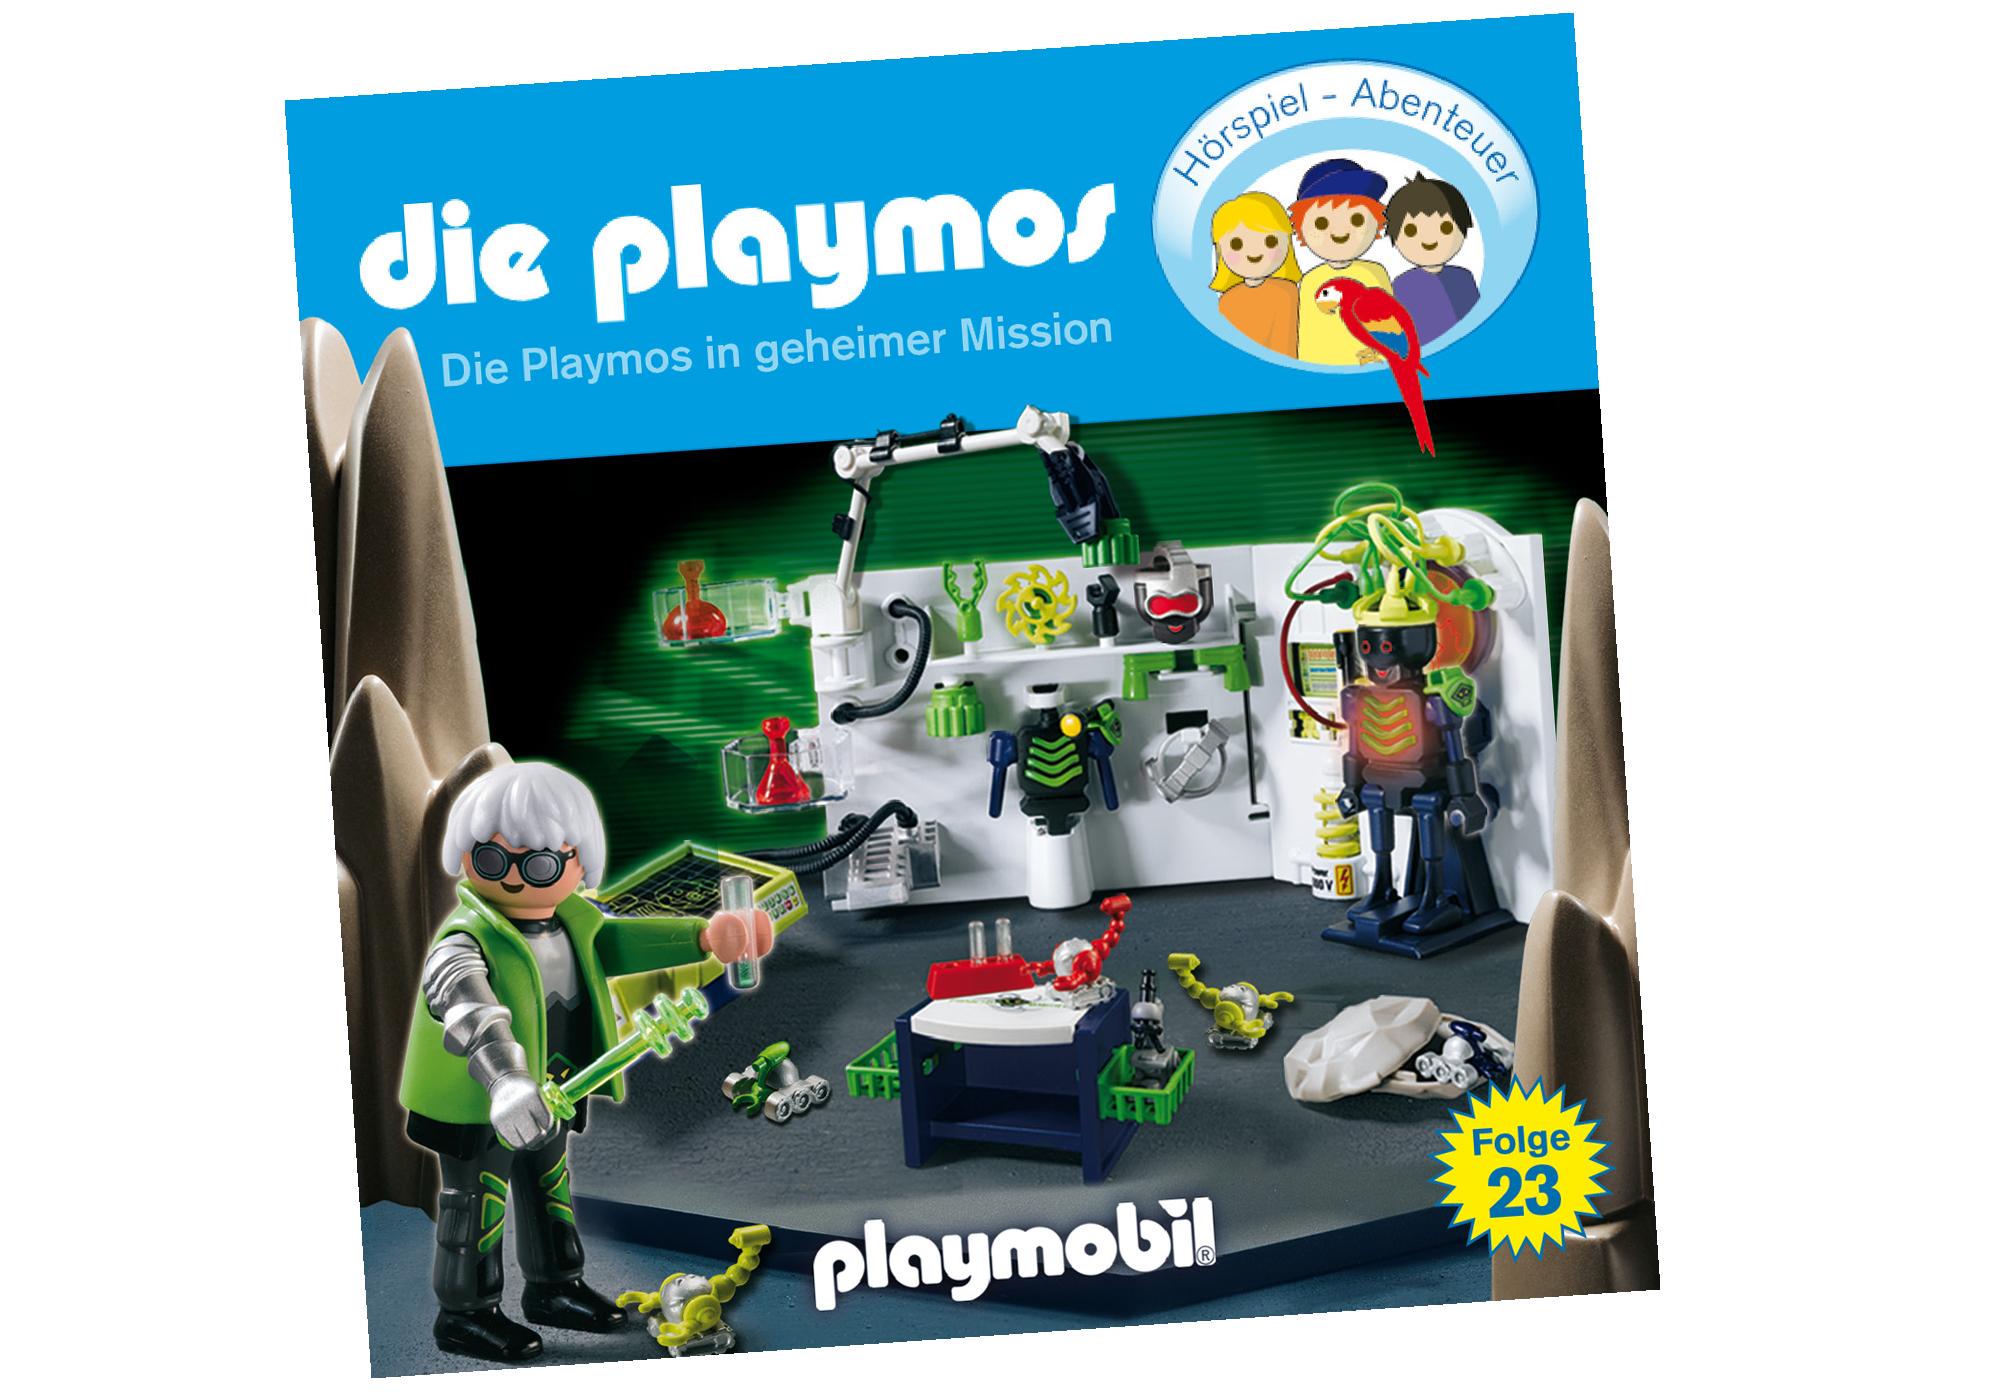 http://media.playmobil.com/i/playmobil/80329_product_detail/Die Playmos in geheimer Mission (23) - CD